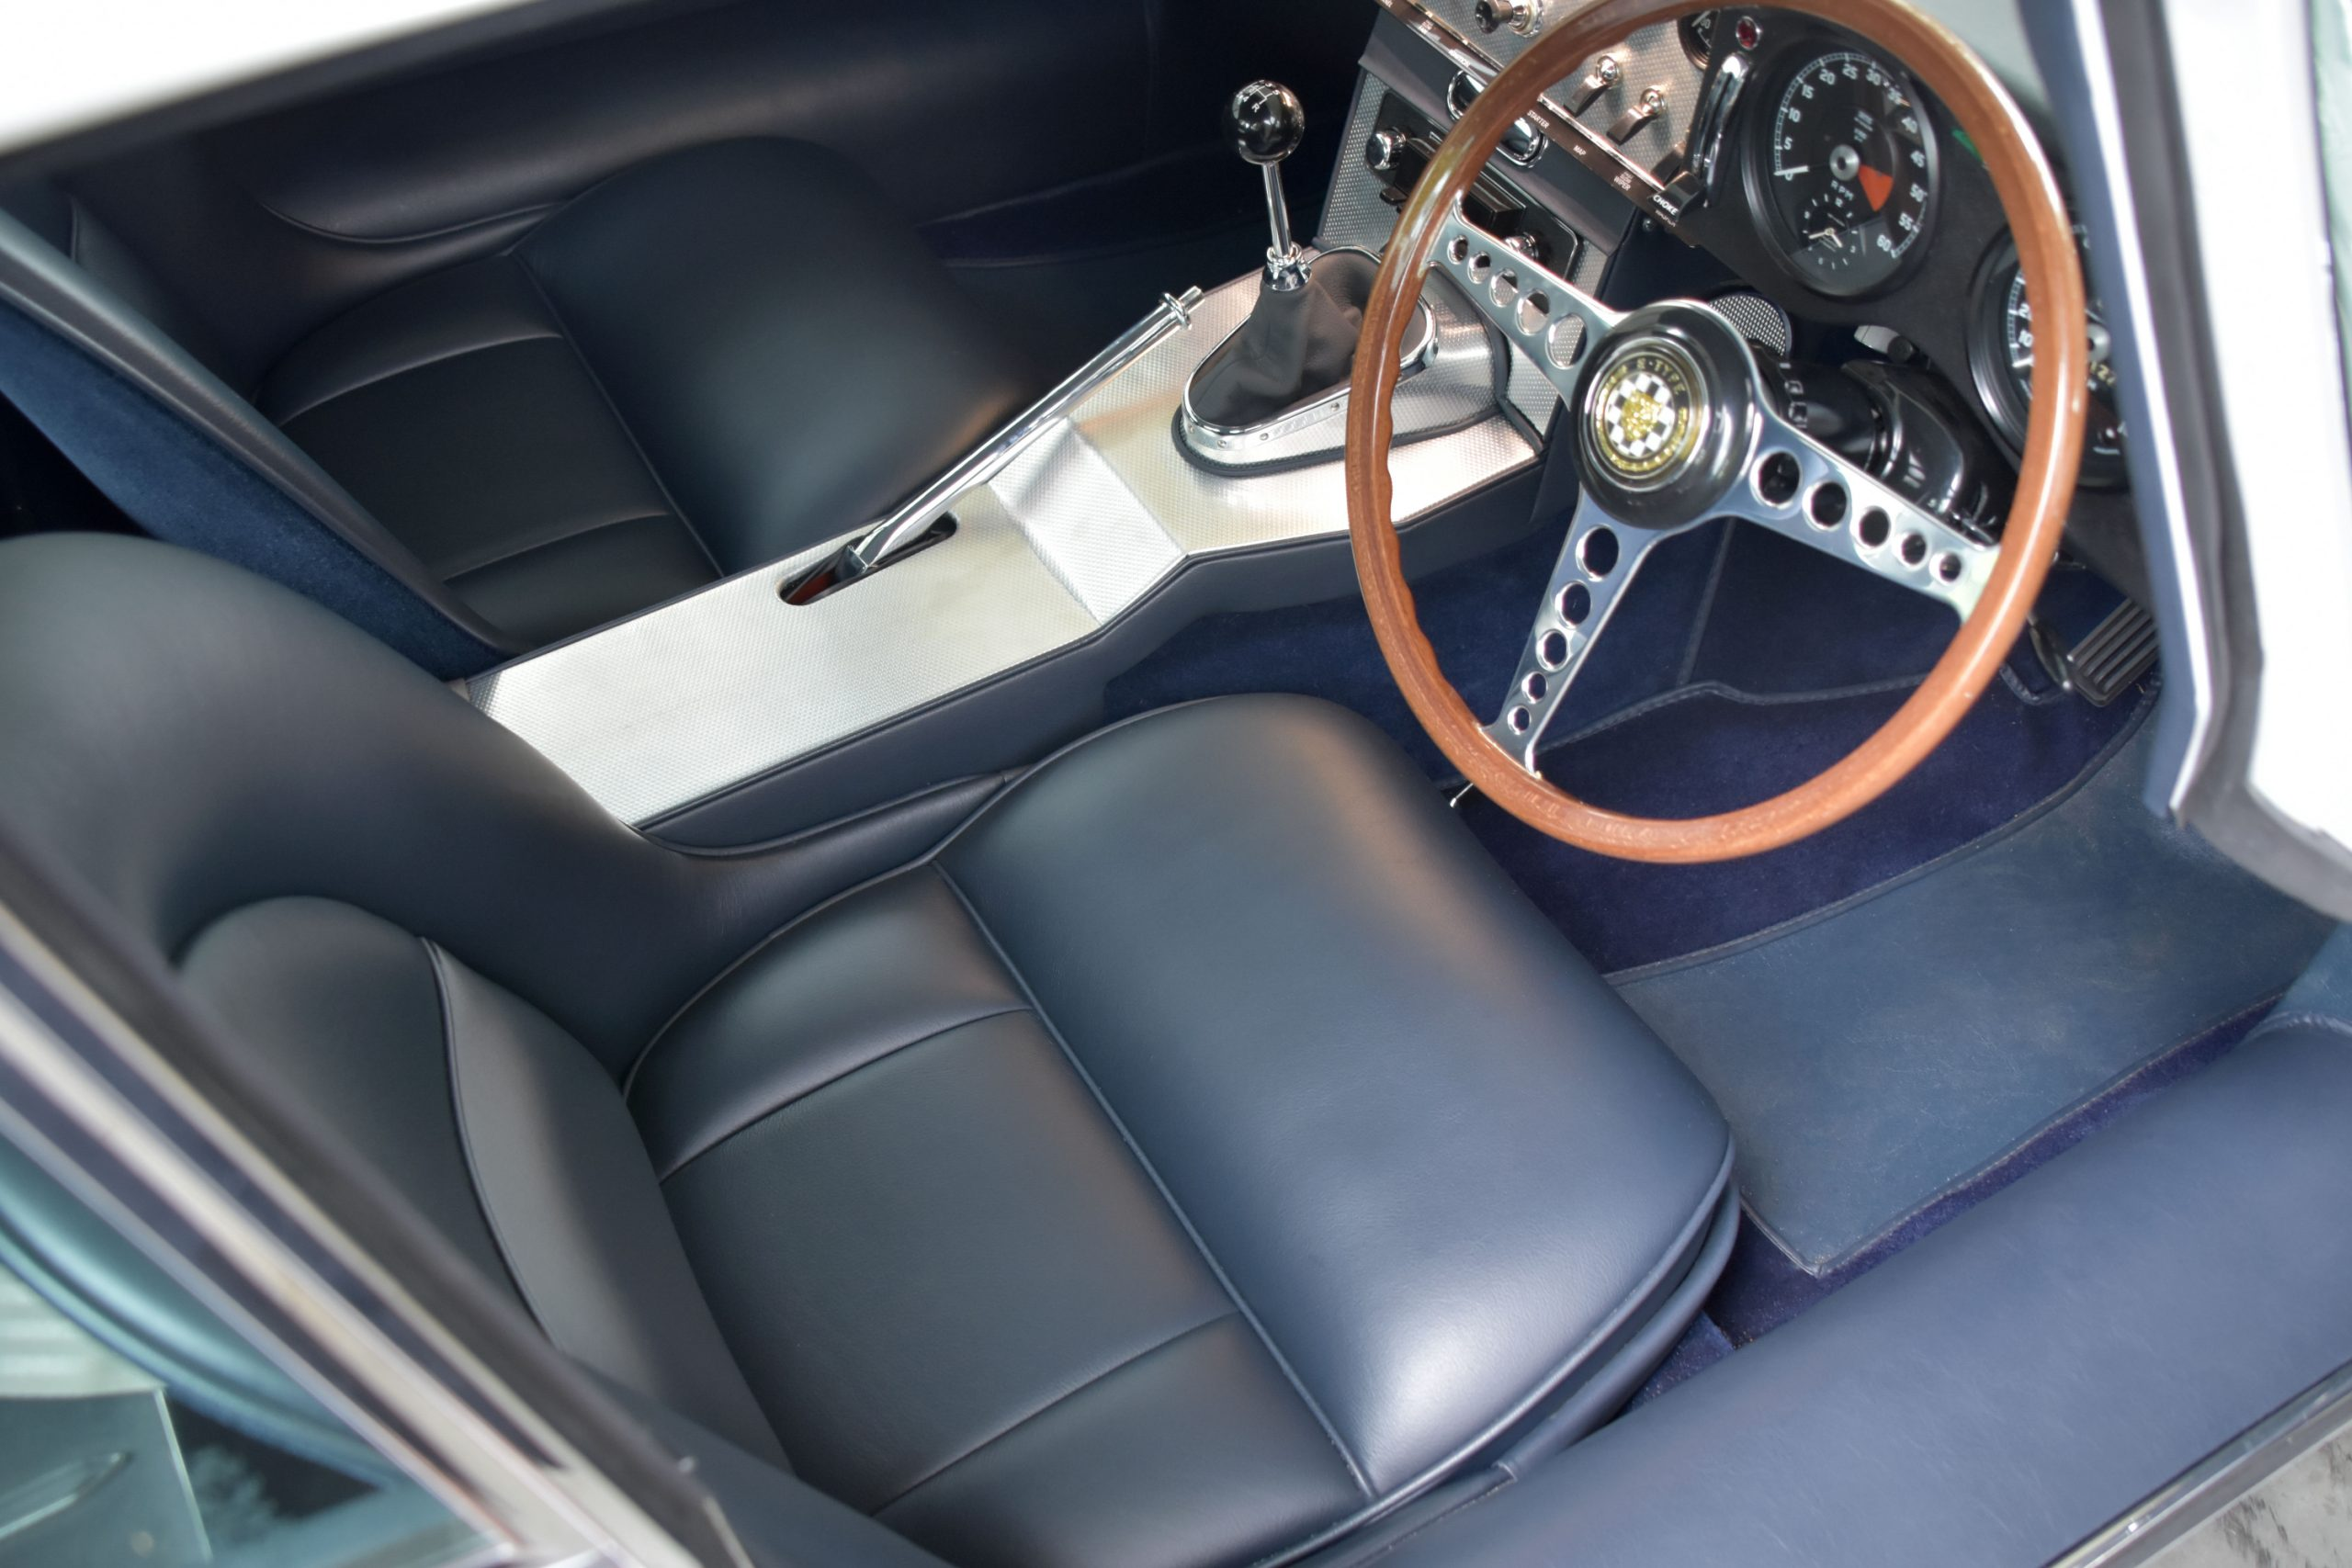 1964 Series 1 FHC Jaguar E-Type